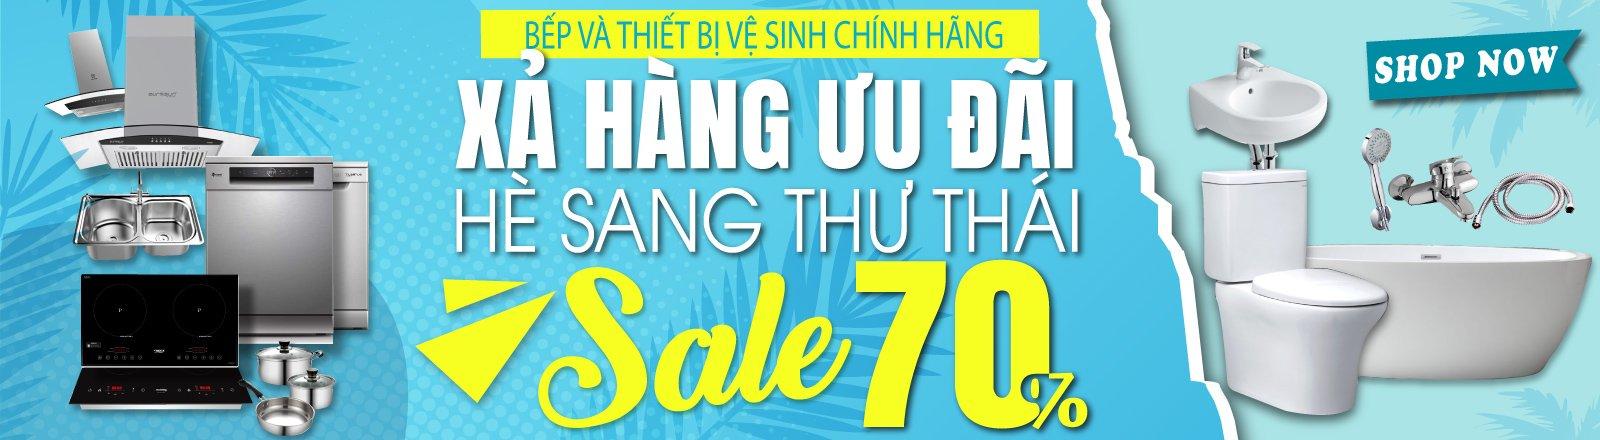 Bep Thanh Vinh Banner